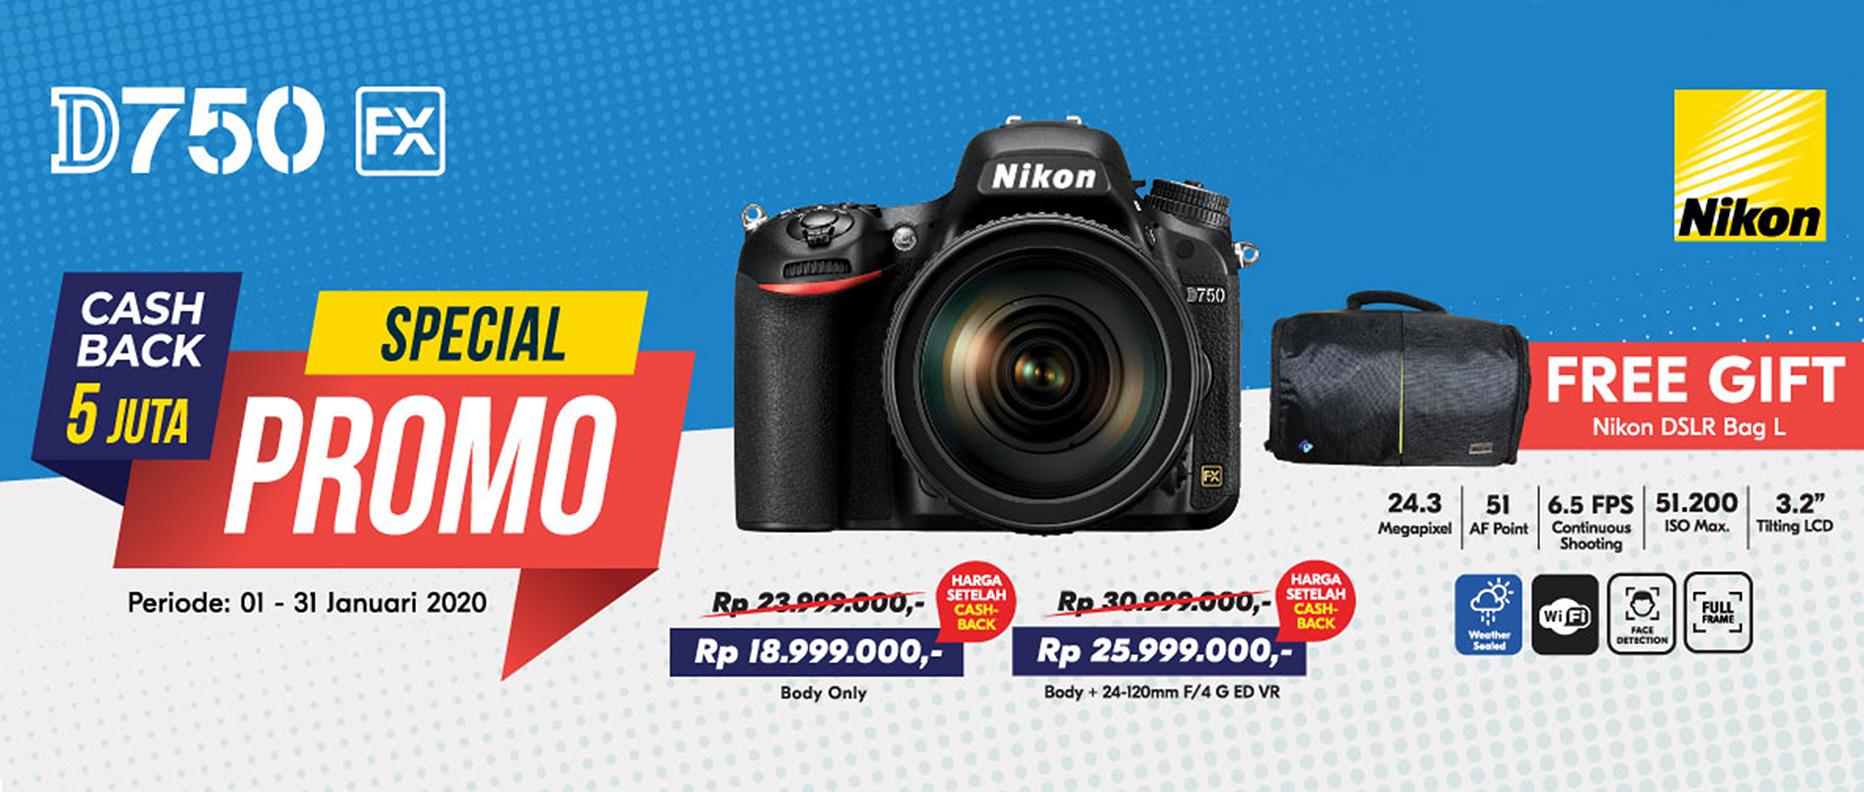 Promo Nikon D750